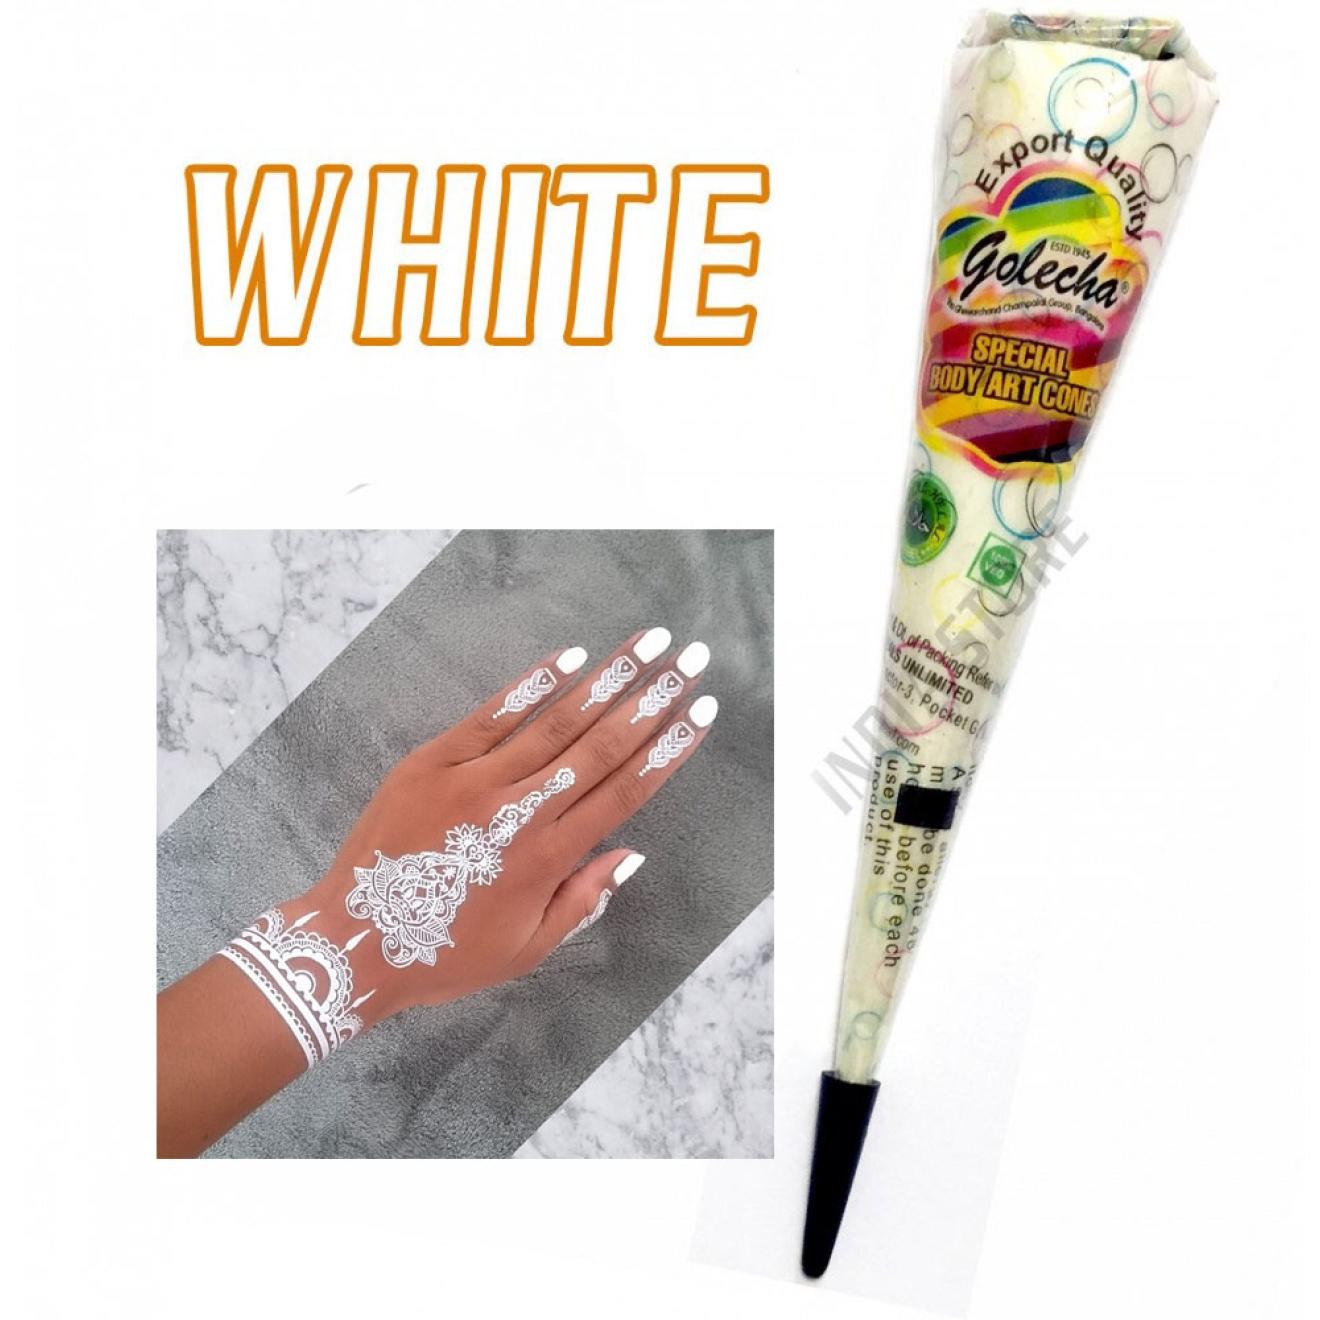 Golecha Henna Paste Black White